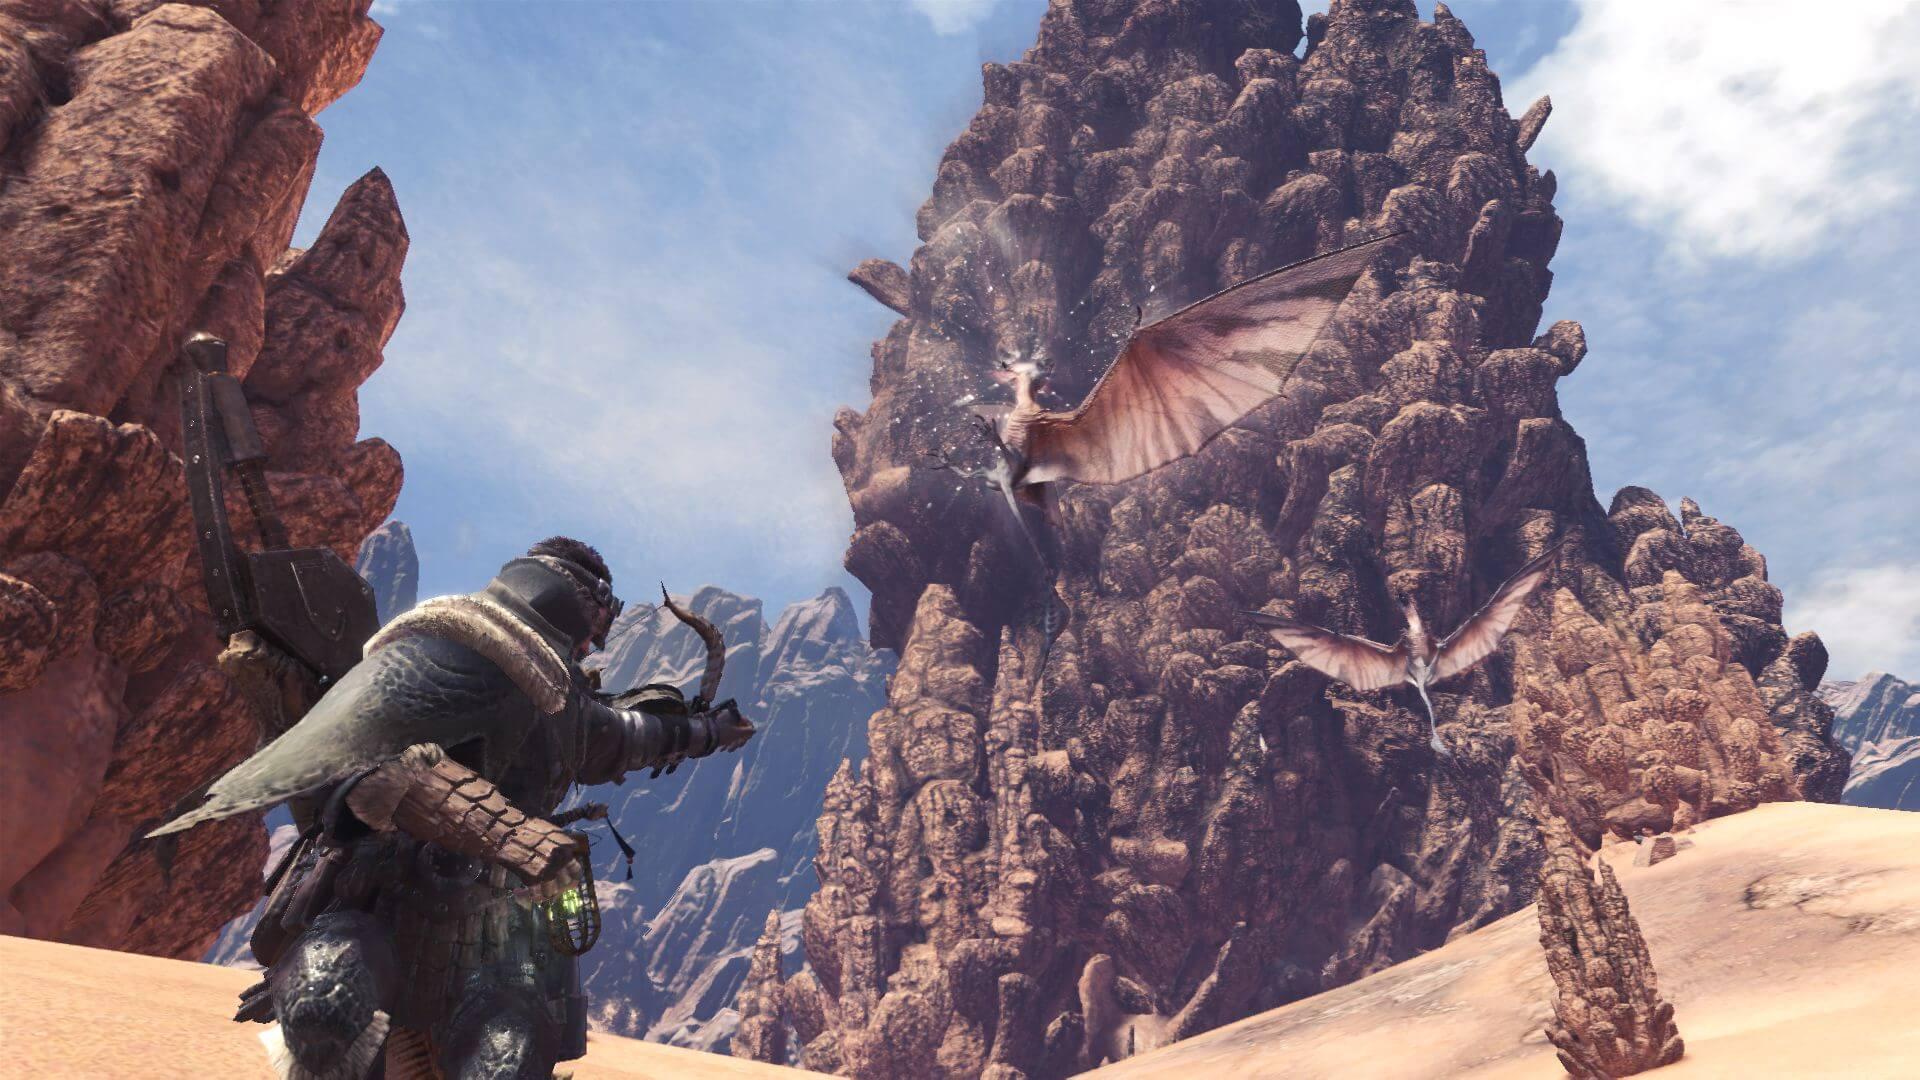 Impresiones de Monster Hunter World tras jugar su beta 1